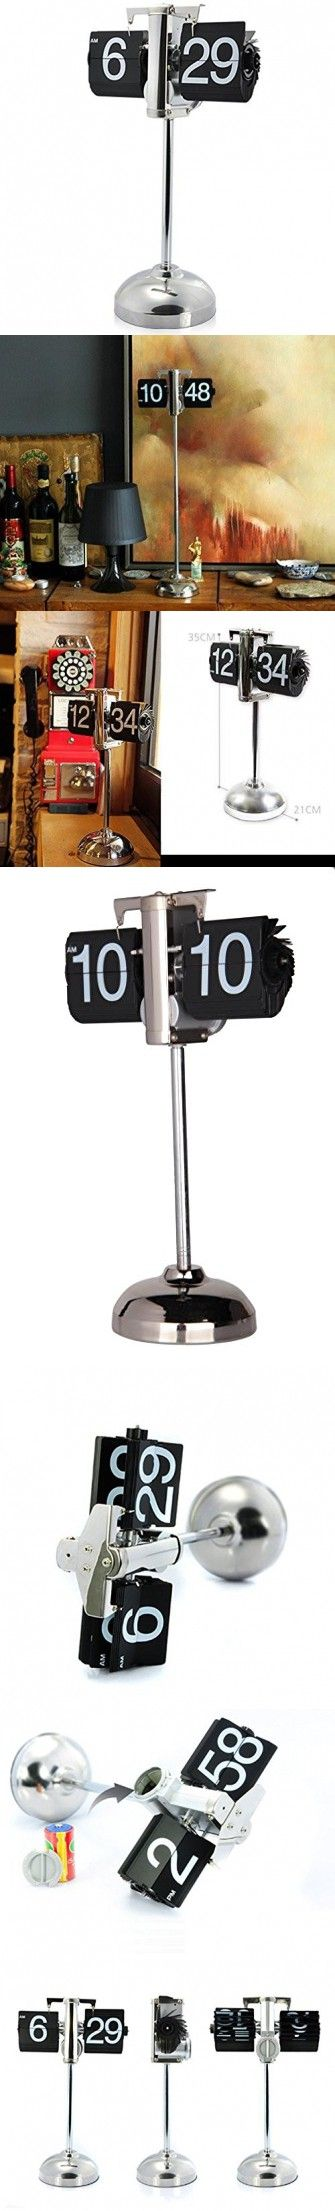 Niceeshop(TM) Vintage Retro Internal Gear Operated Flip Down Clock Desktop Clock For Home Decor,Black